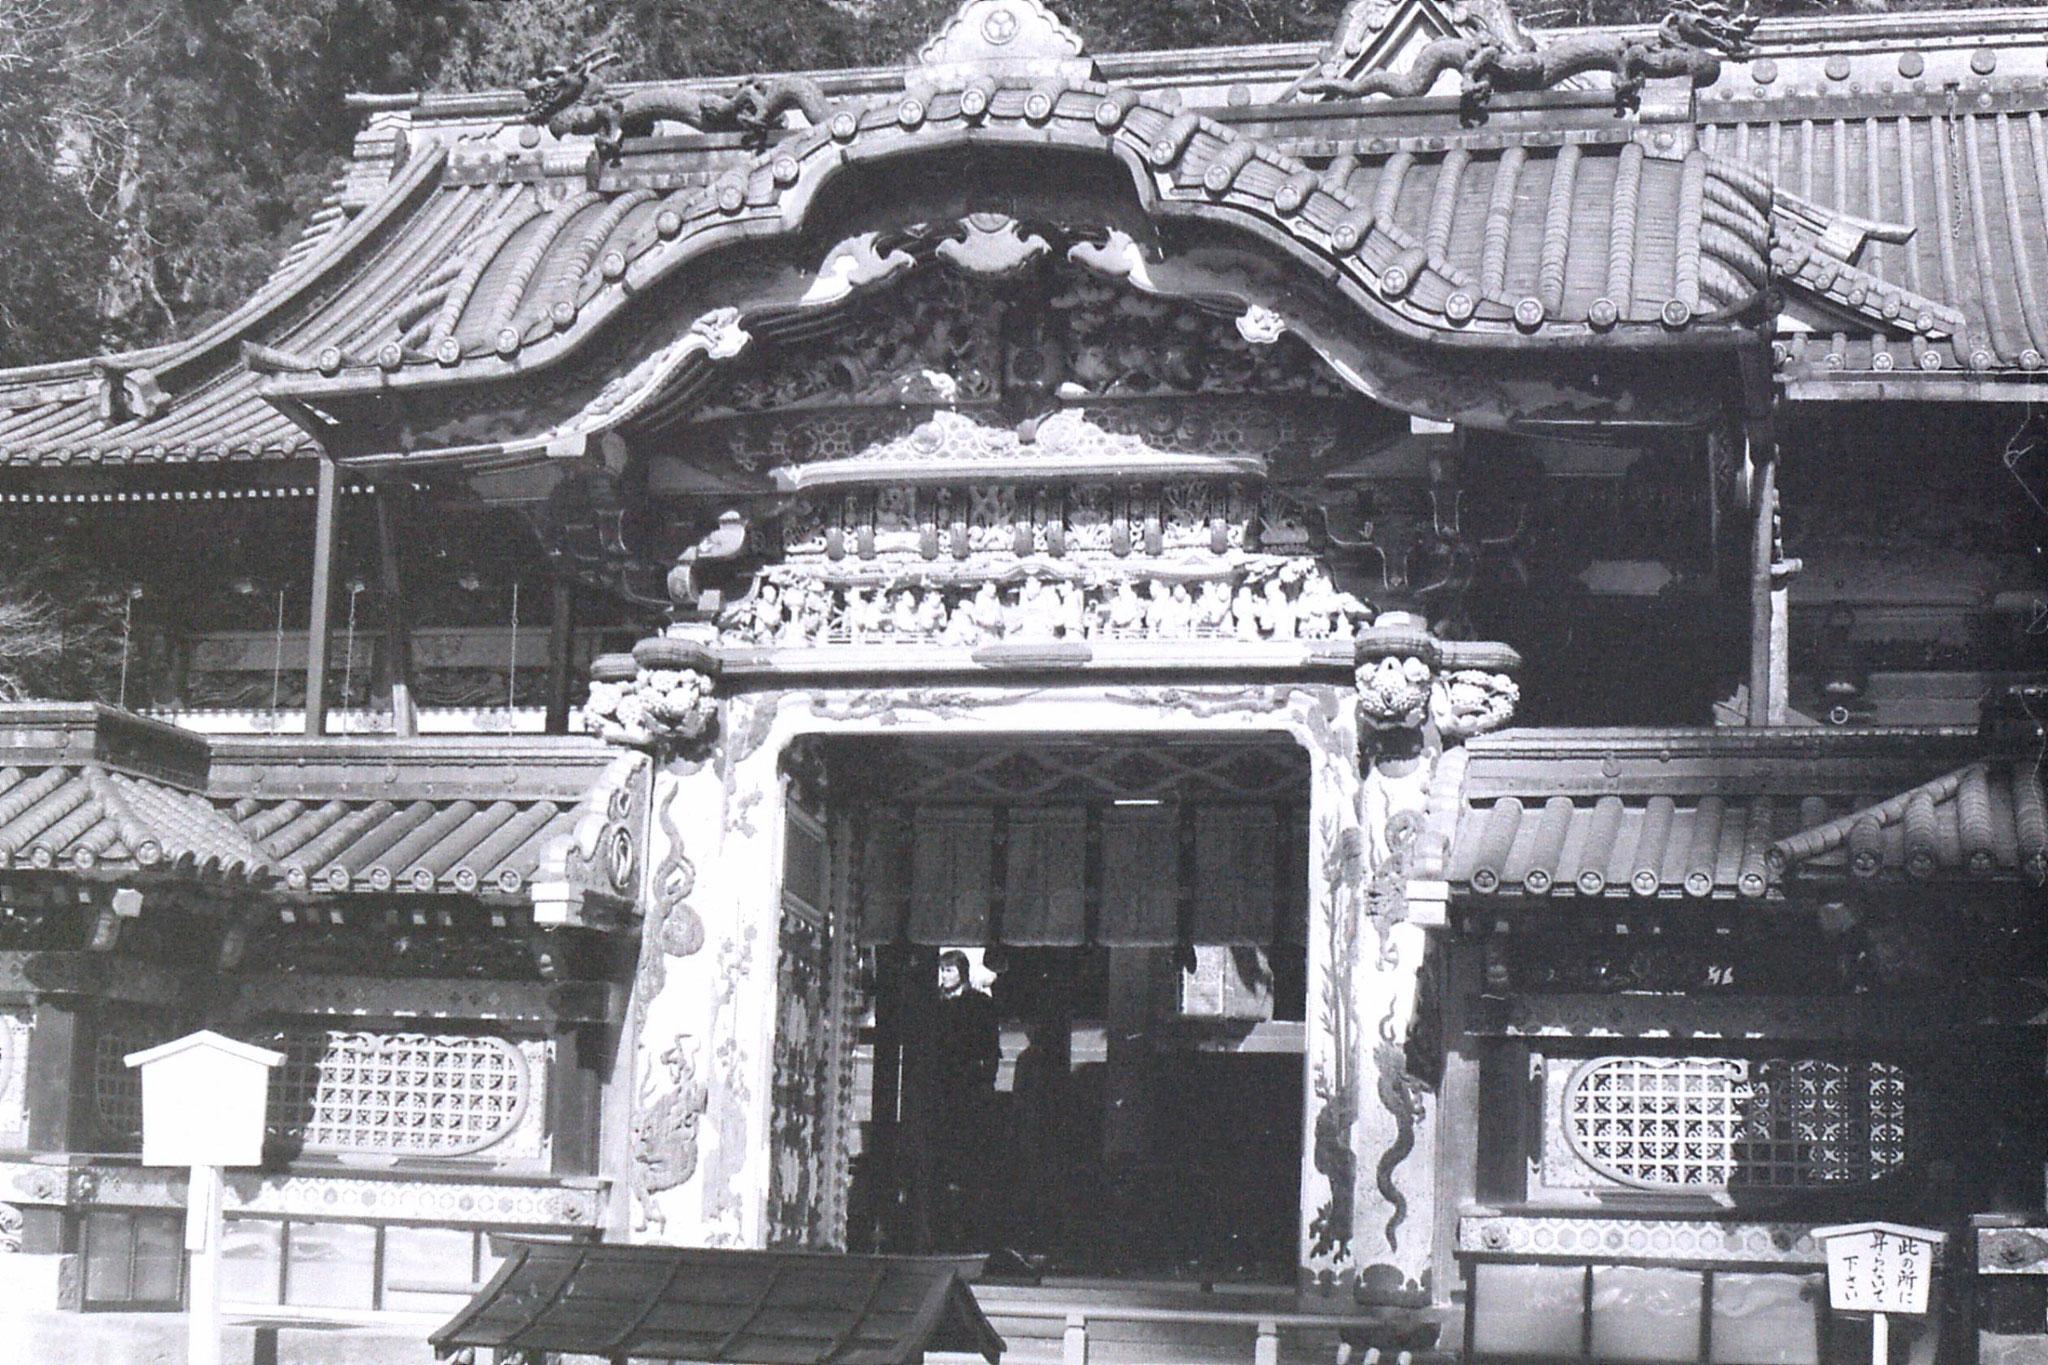 31/1/1989: 1: Toshugu Chinese Gate